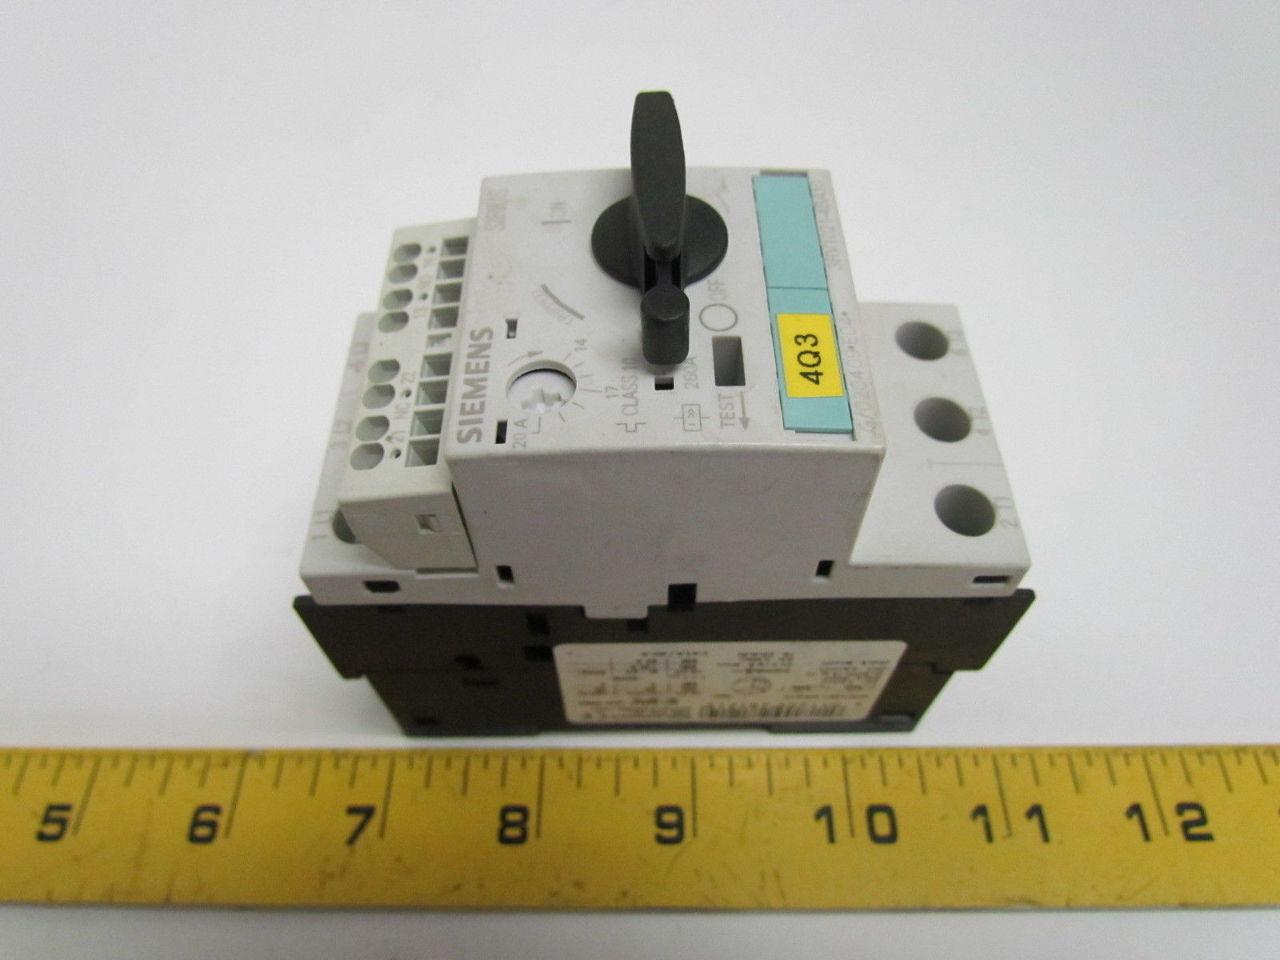 Circuit Breaker 14 20a N Release 260a Size So Motor Protection Class 10 3 Pole Ebay